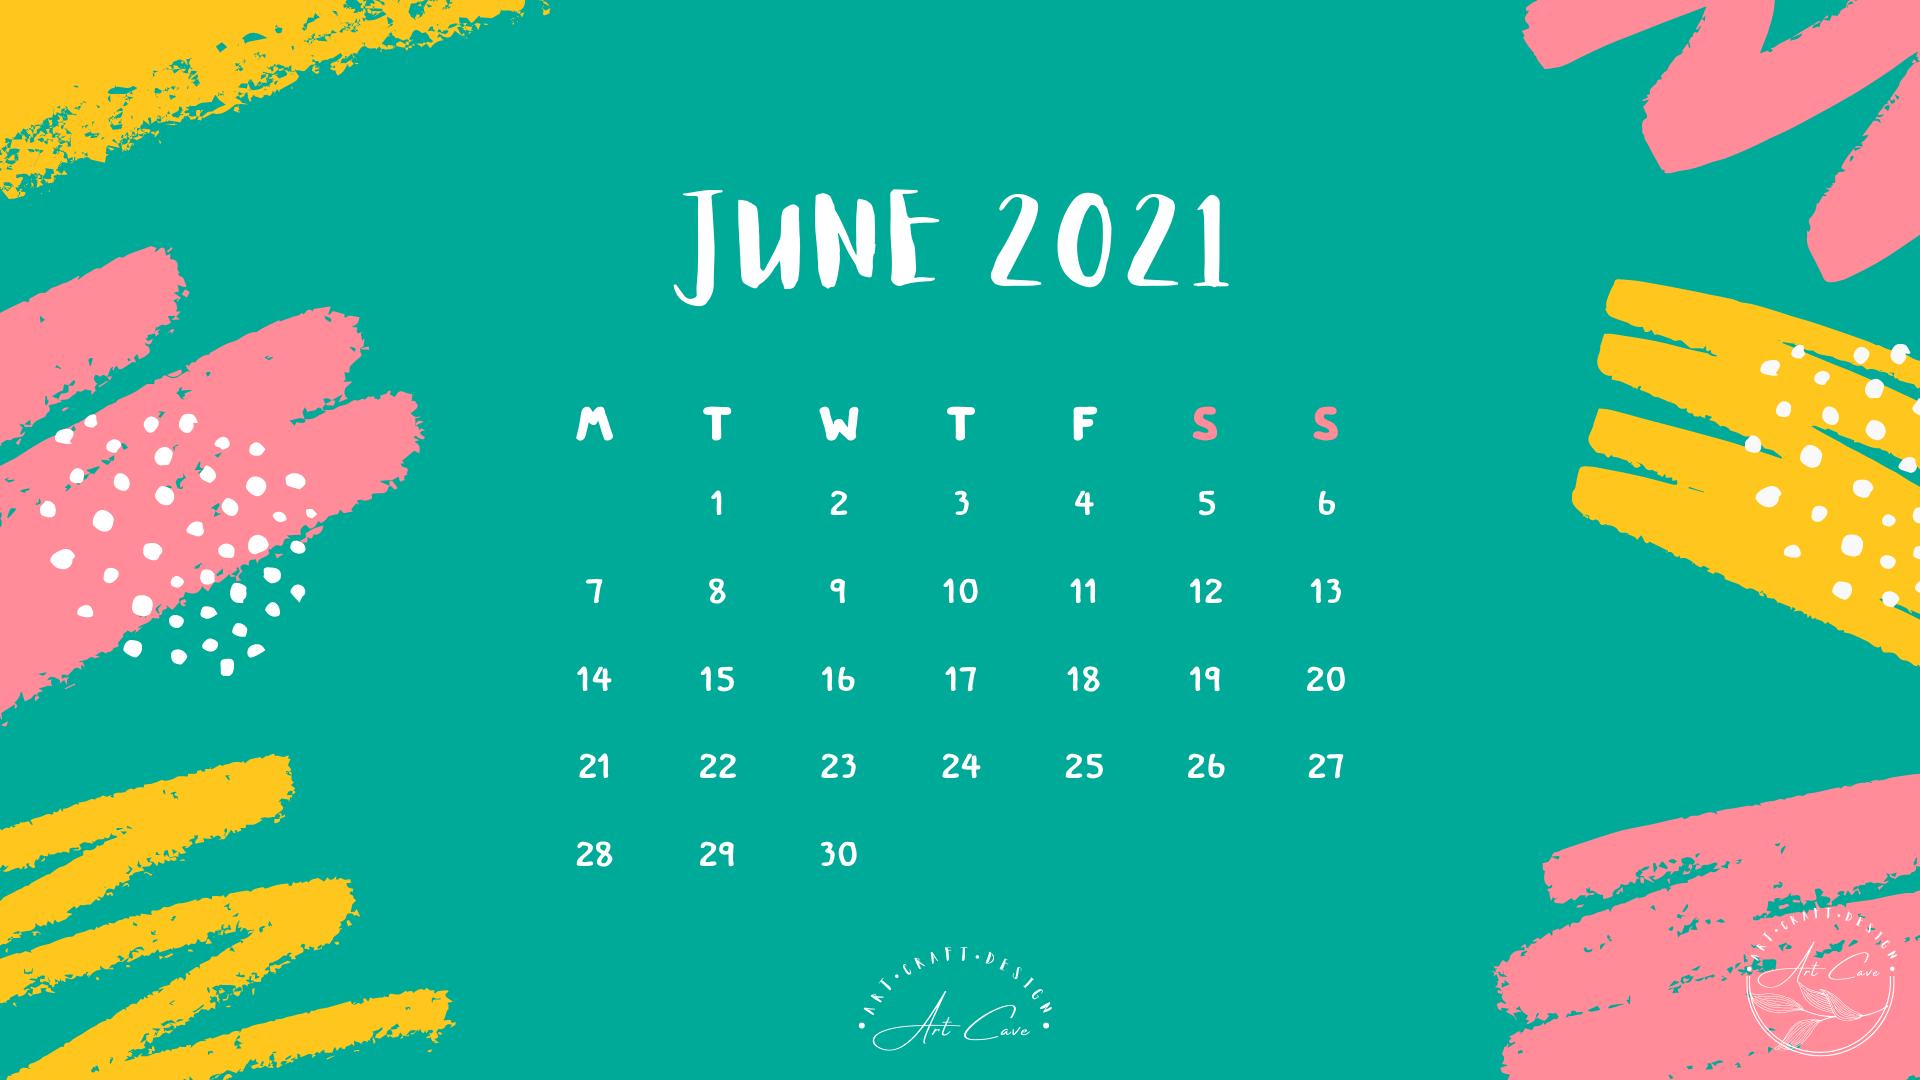 Desktop Calendar June 2021